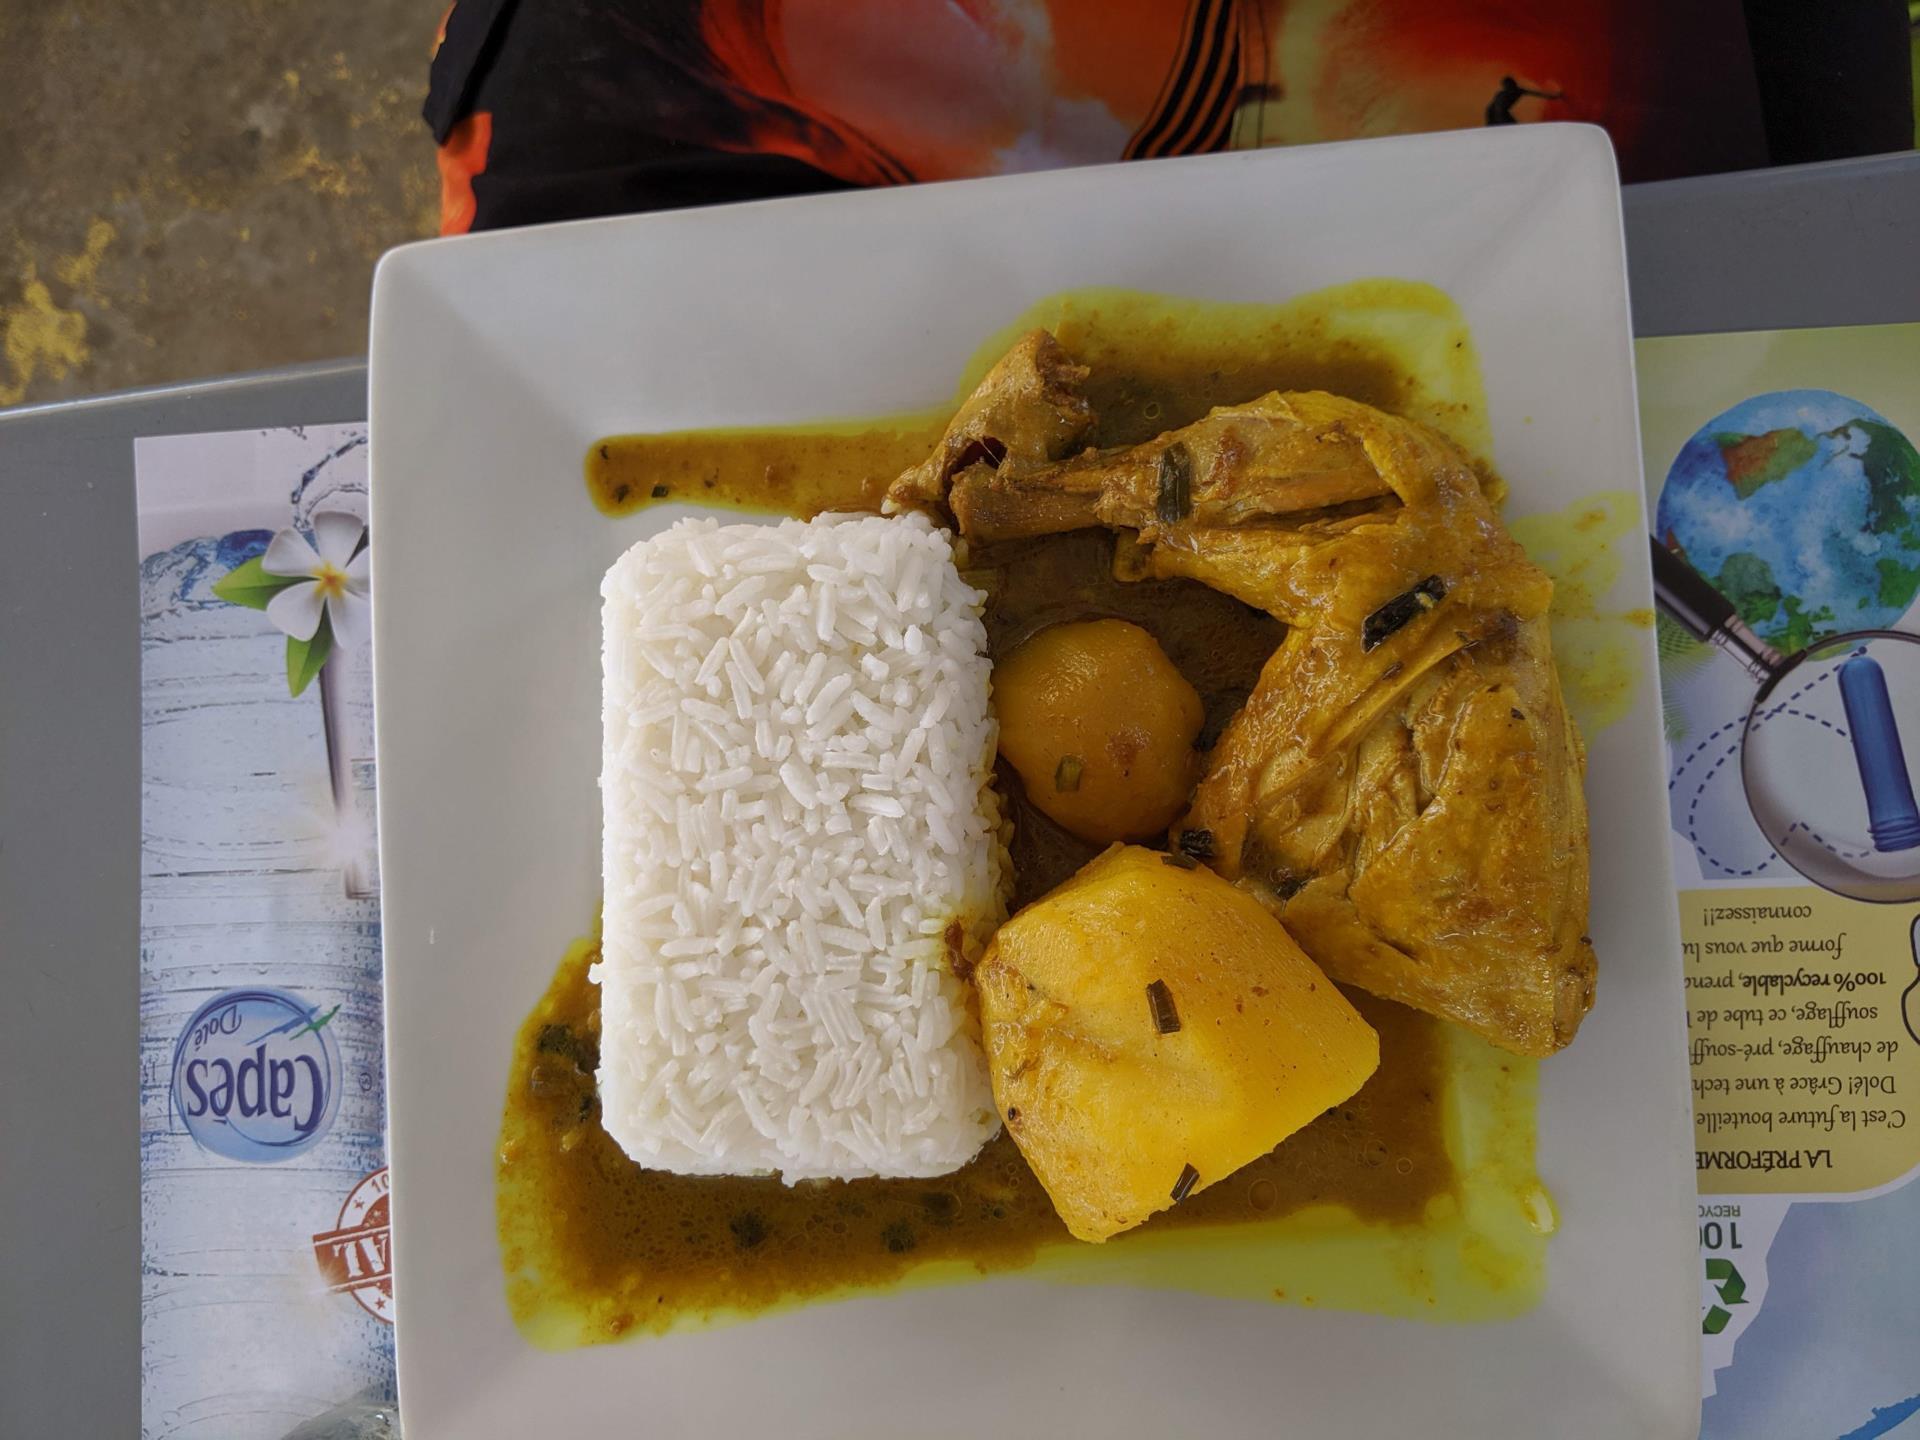 Cosa mangiare a Guadalupa: colombo de poulet